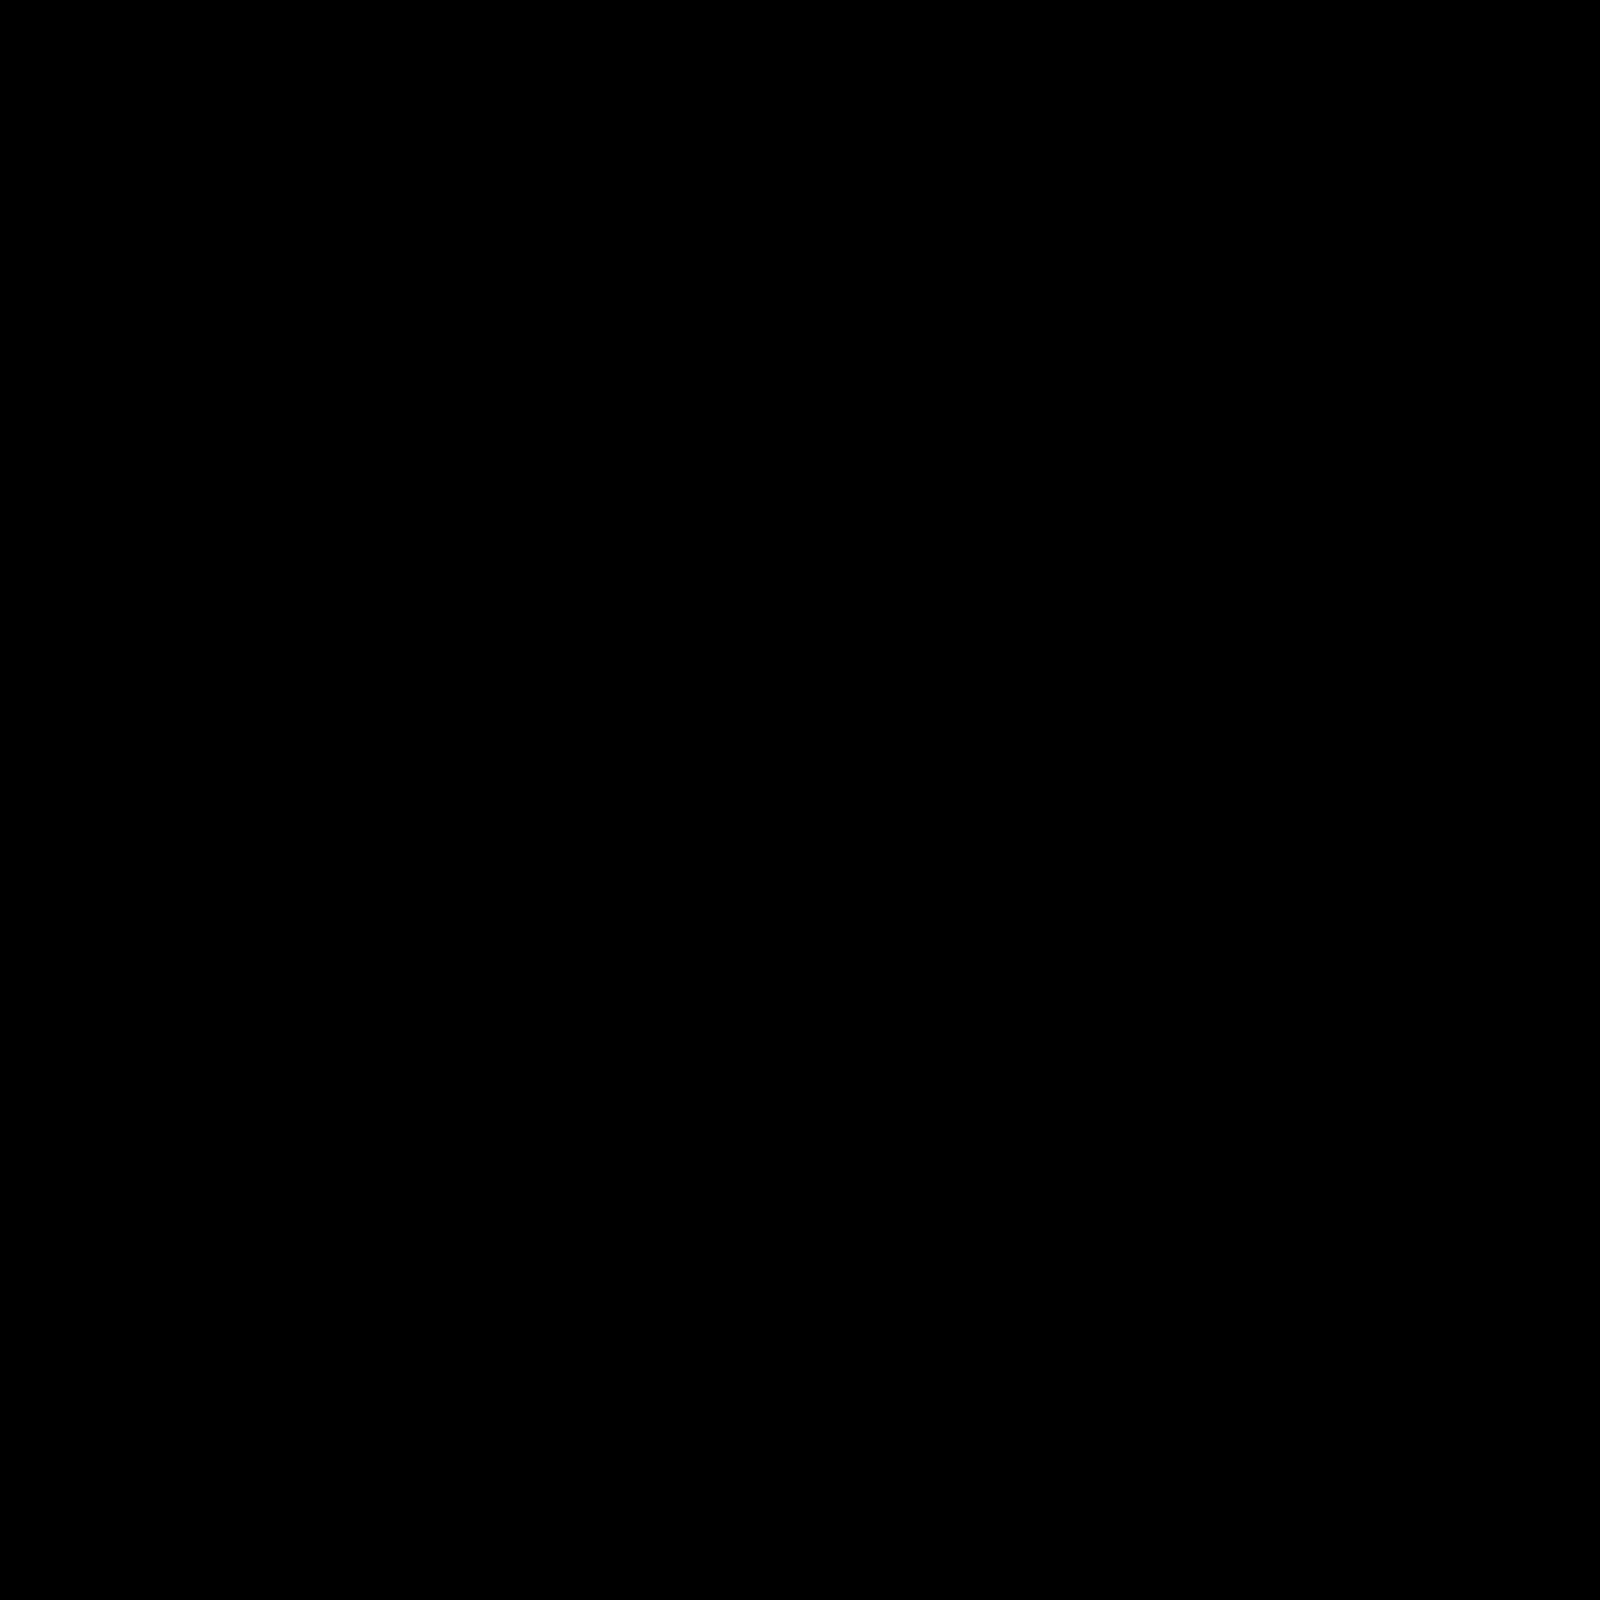 image black and white stock Potato icon free download. Potatoes clipart vector